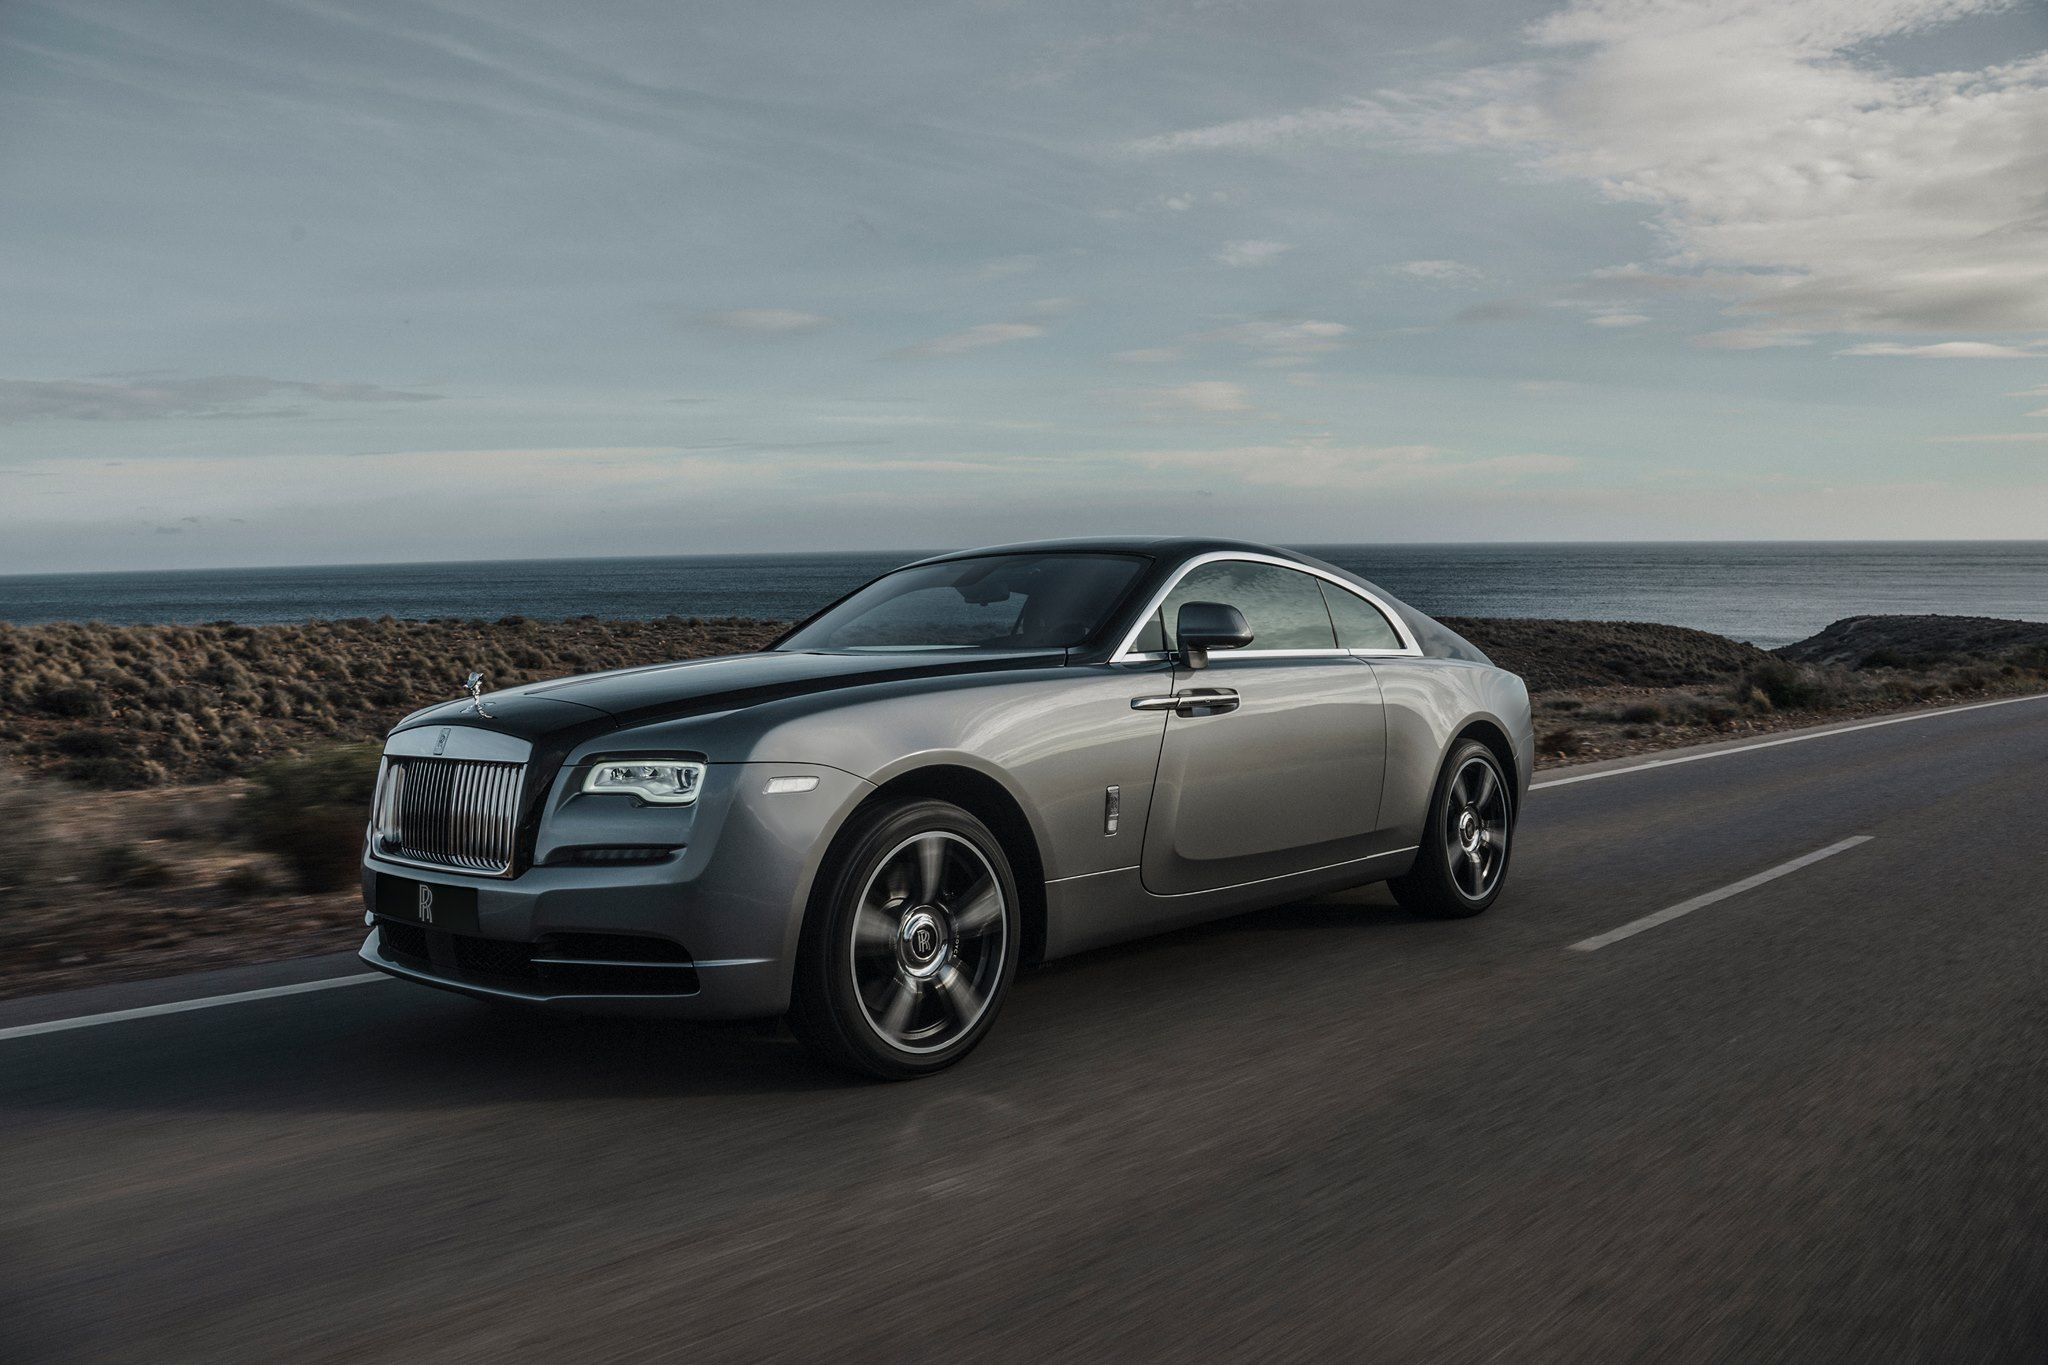 Be Amazing Rolls Royce Wraith MY17 Facelift